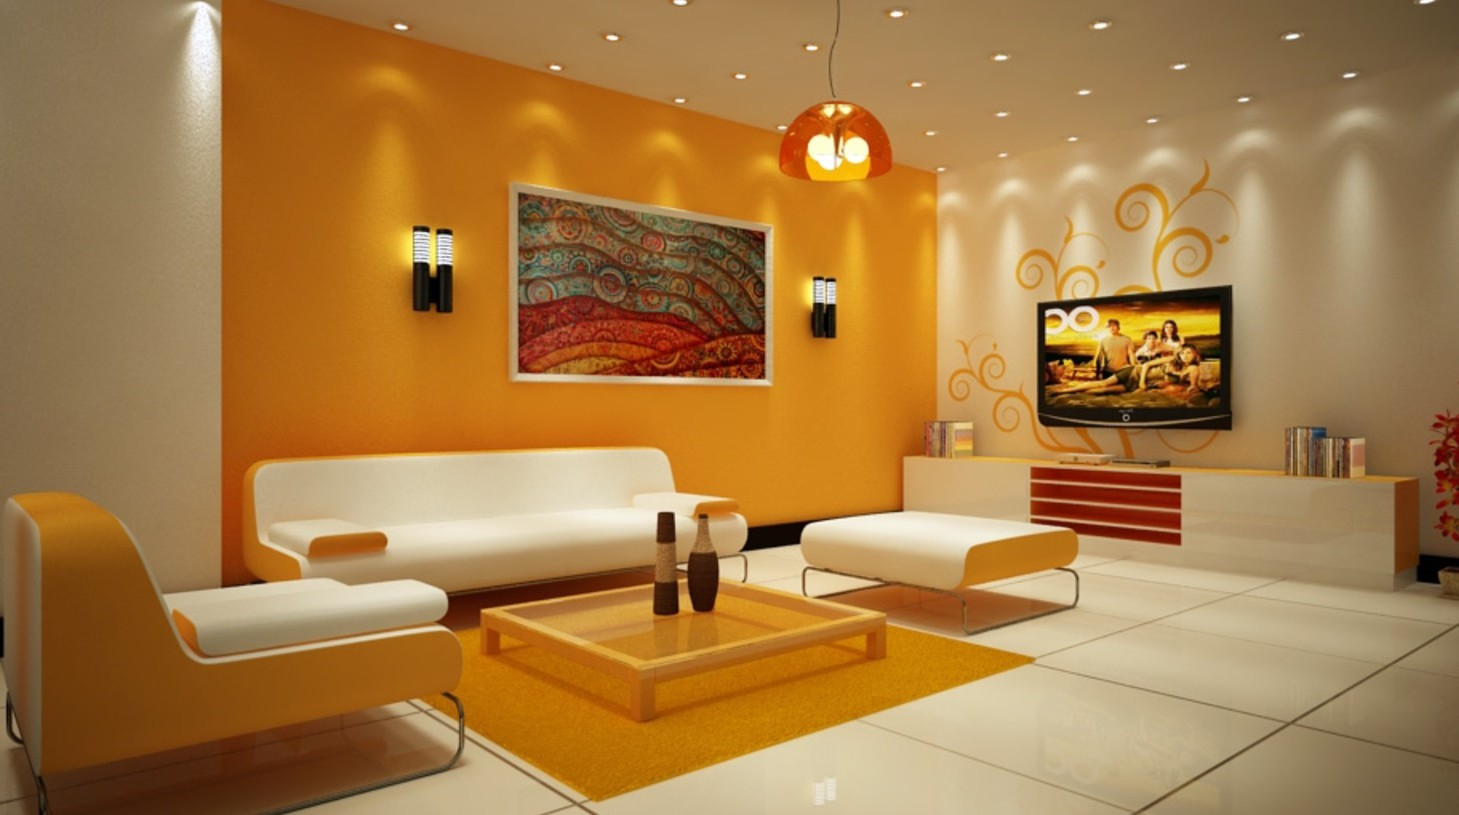 Покраска стен разными цветами сочетание